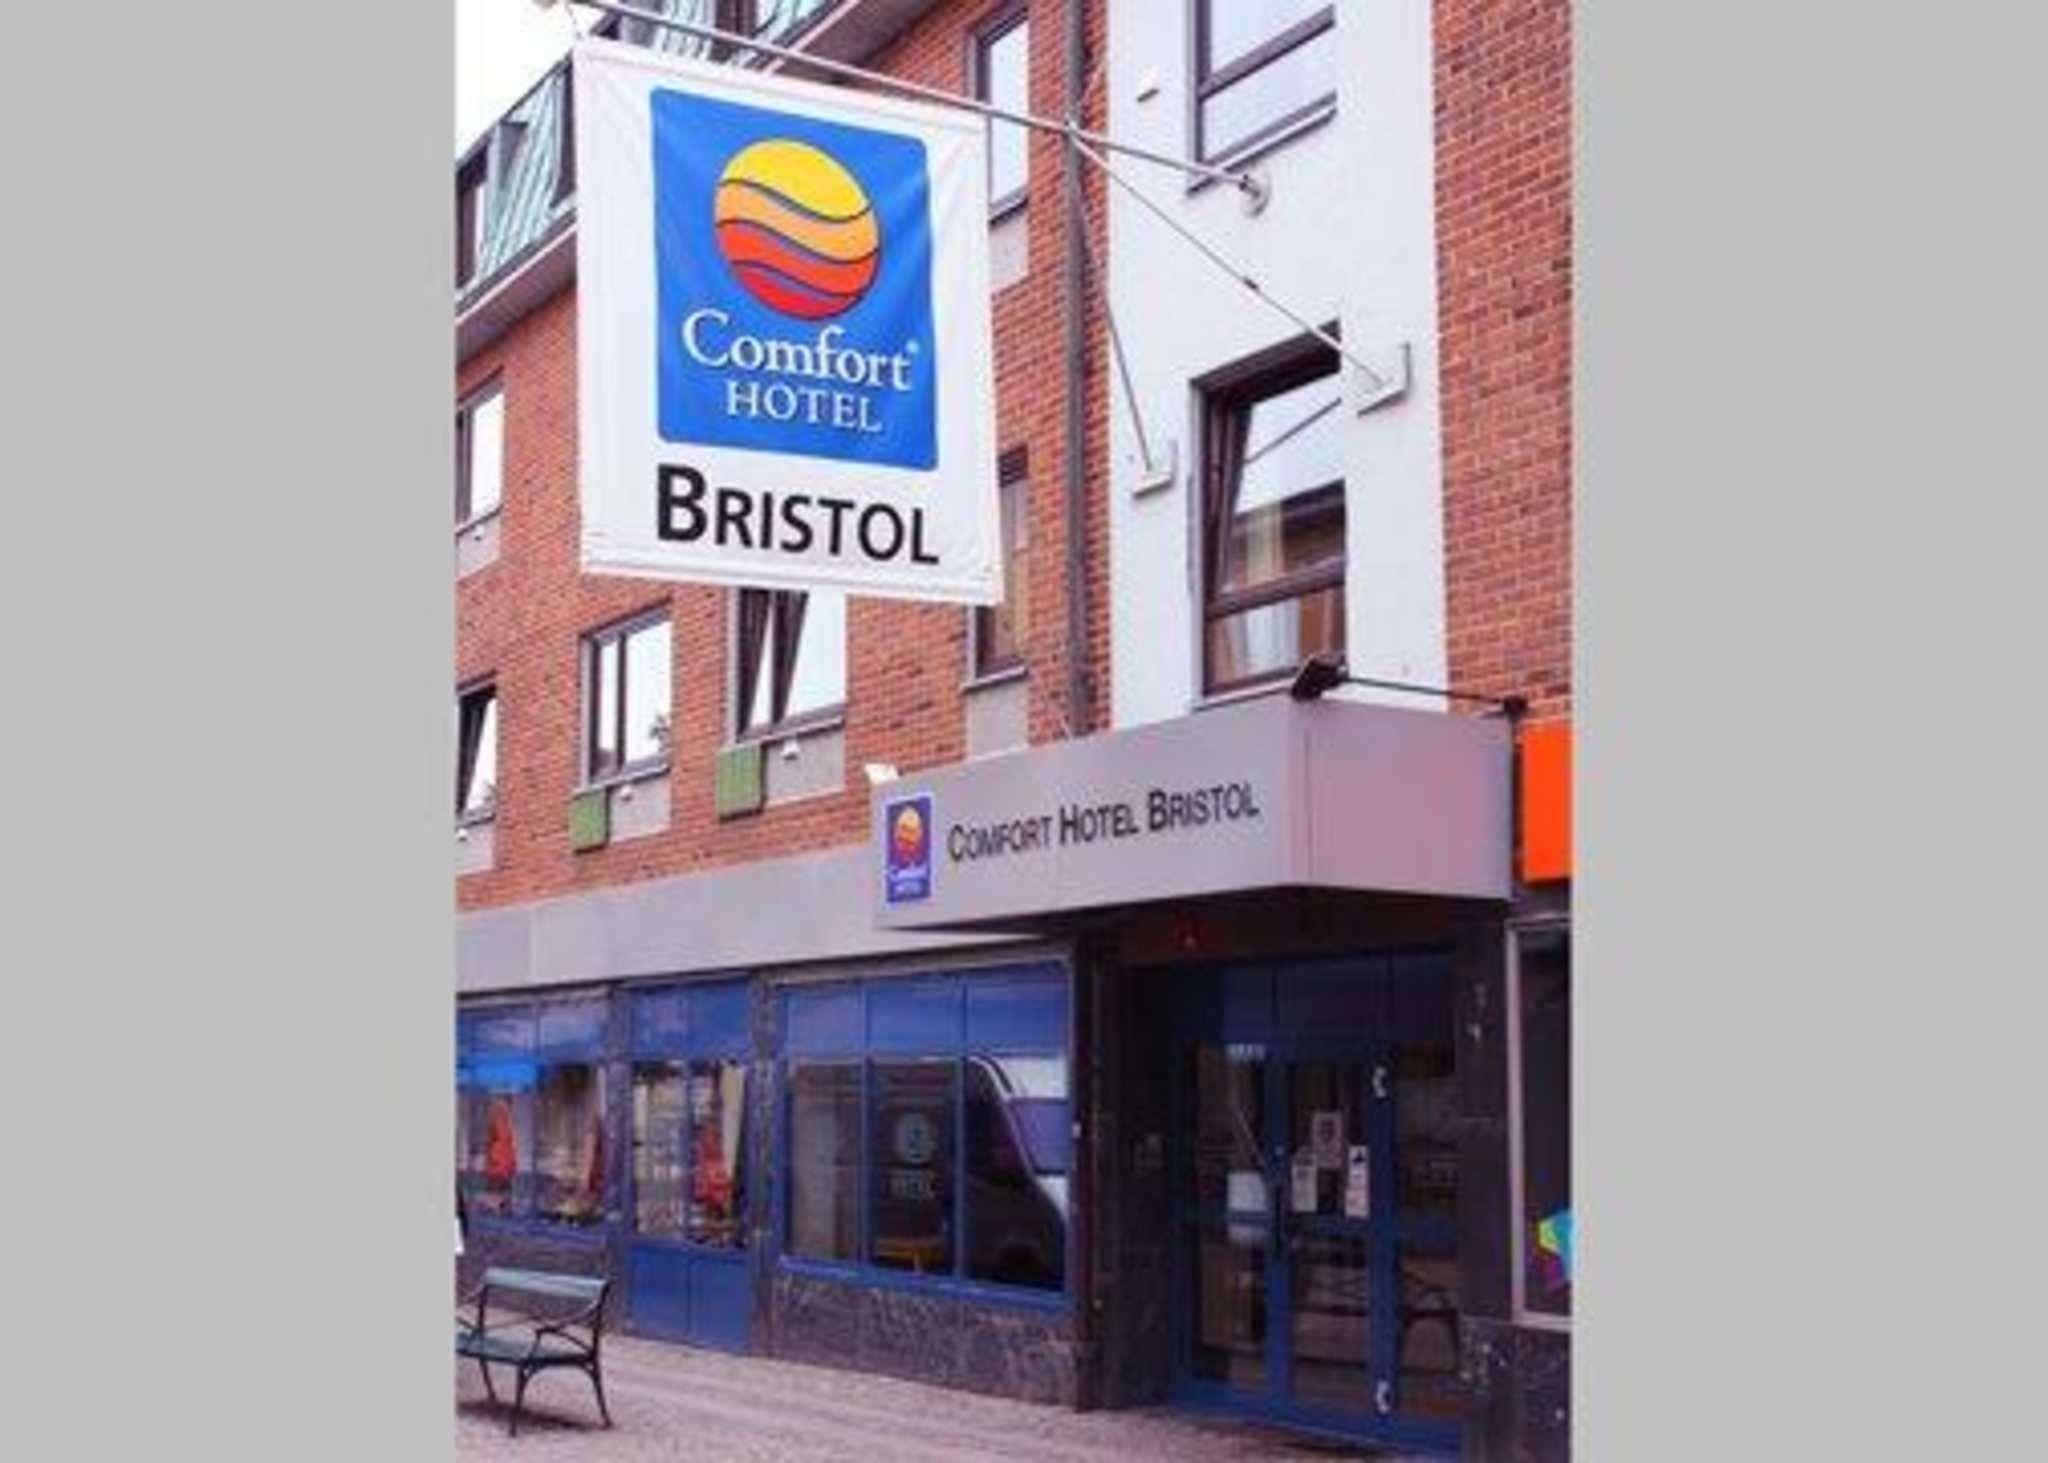 Comfort Hotel Bristol, Arvika